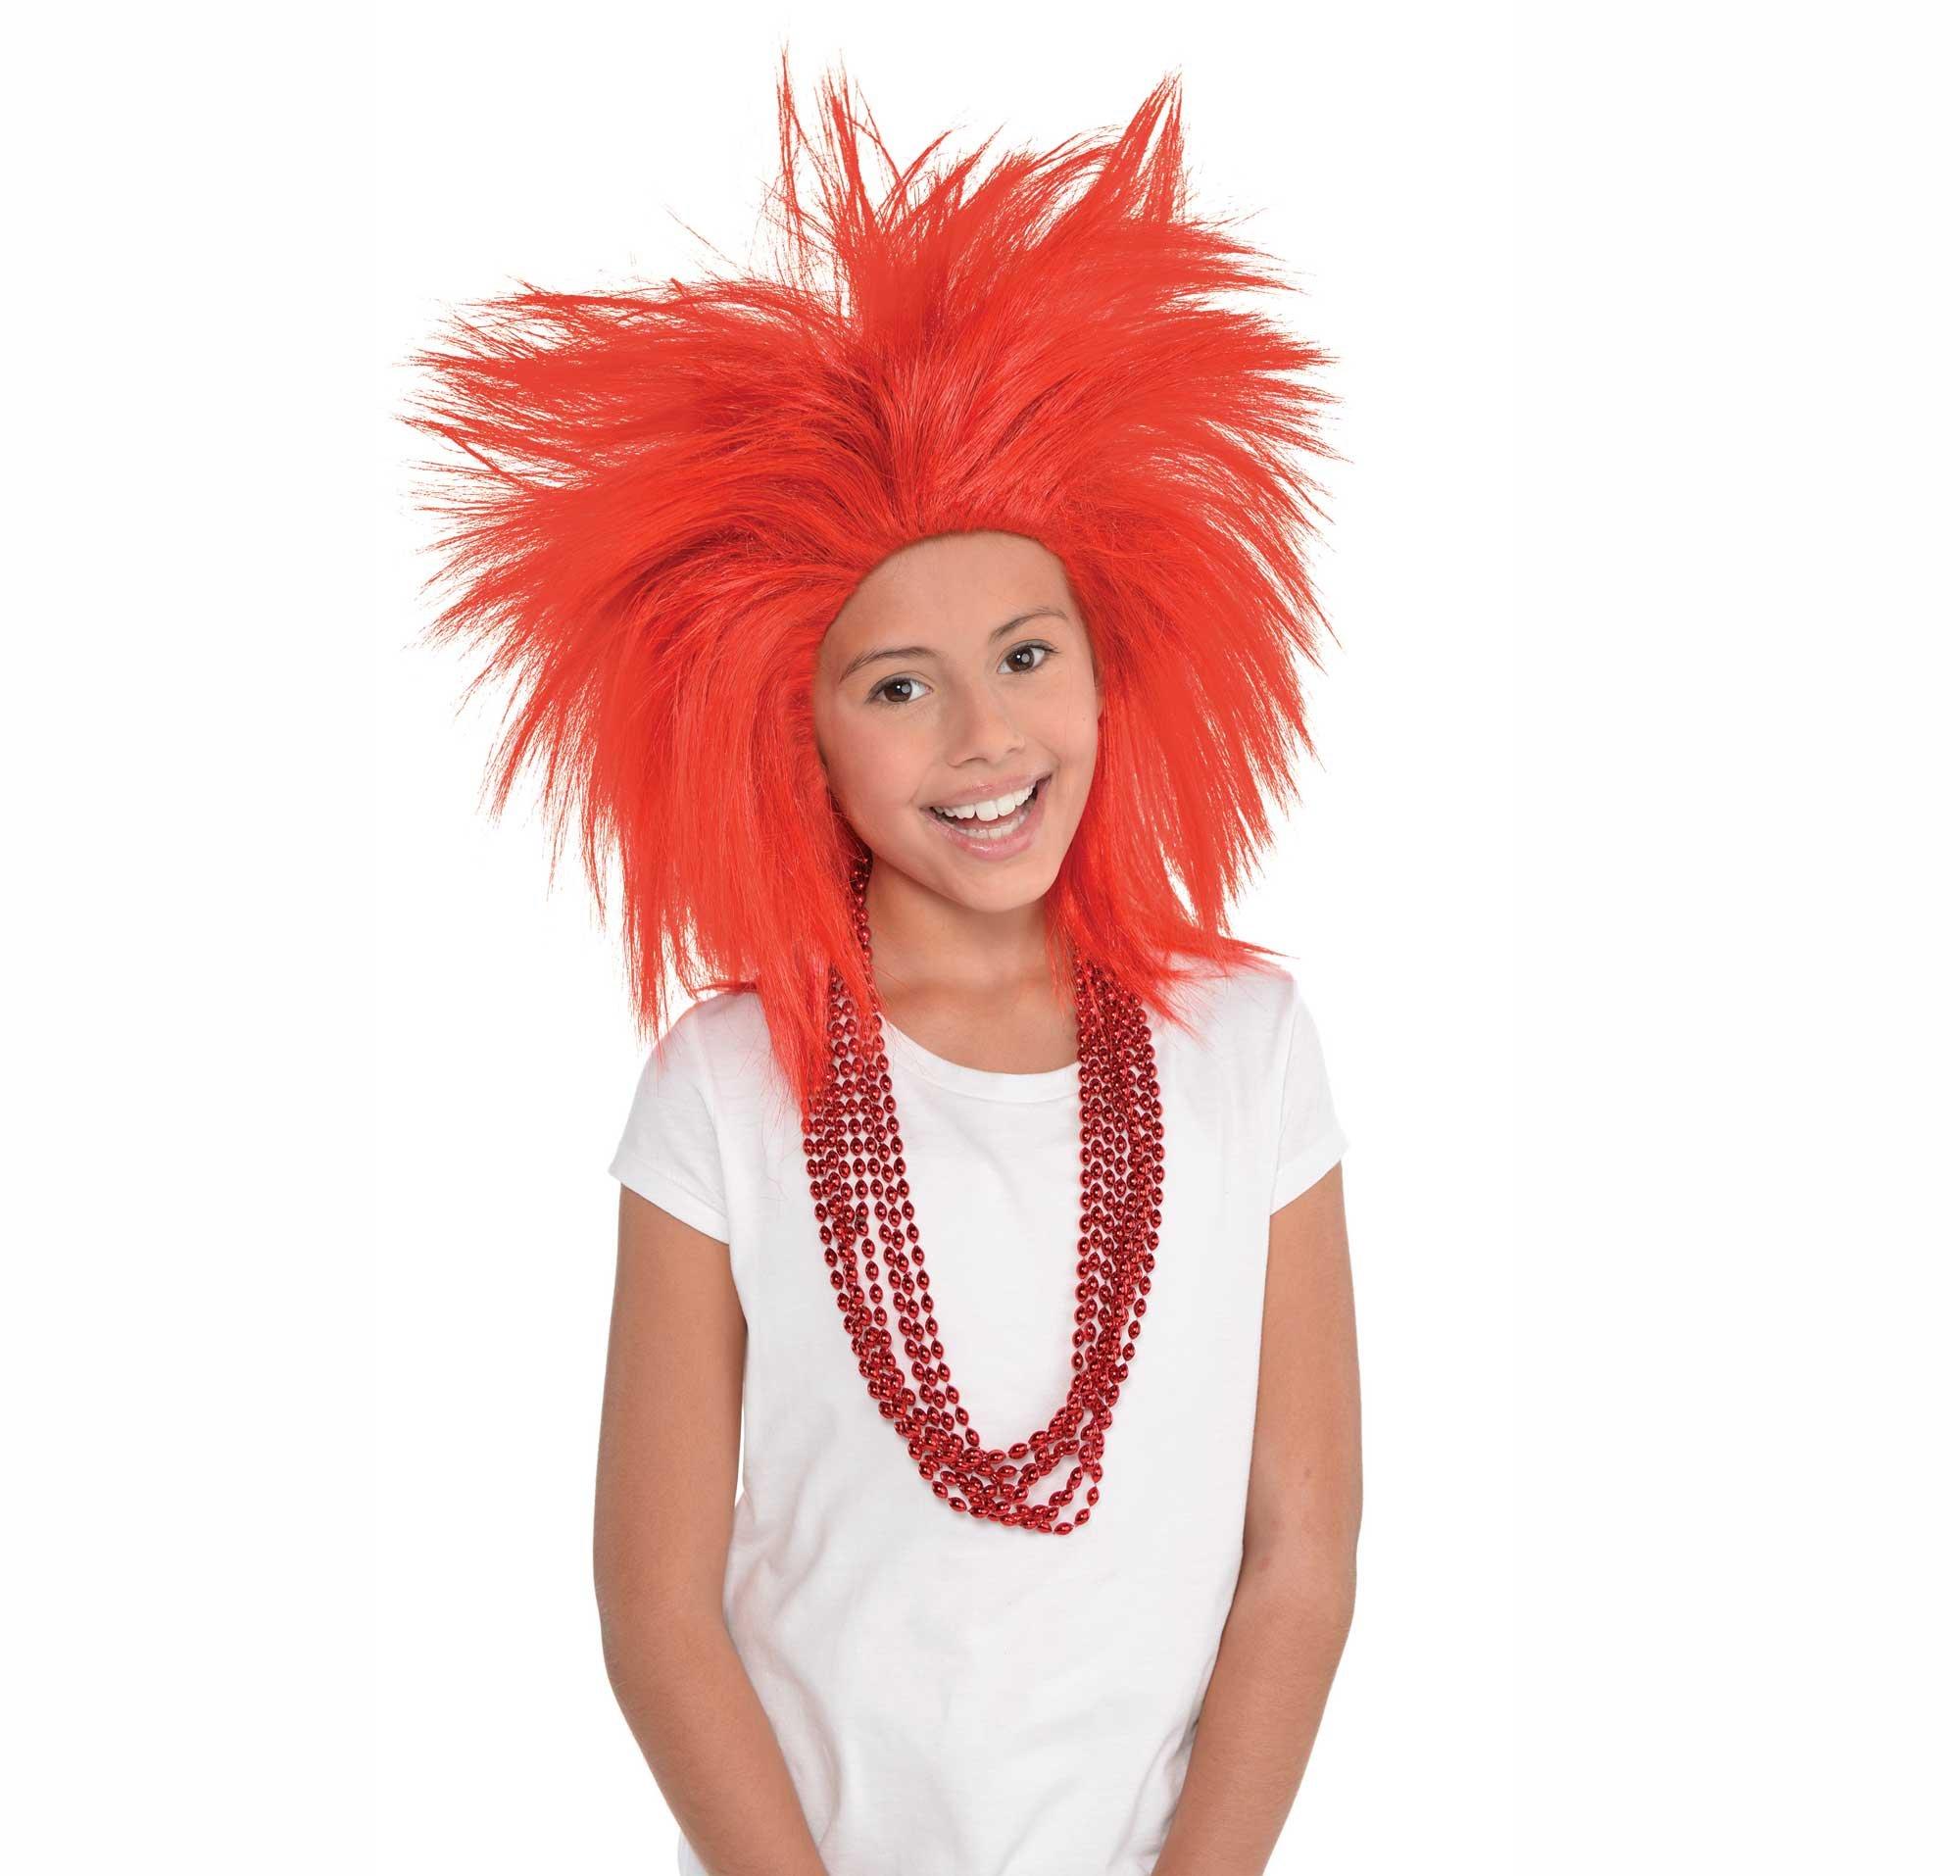 Crazy Wig - Red